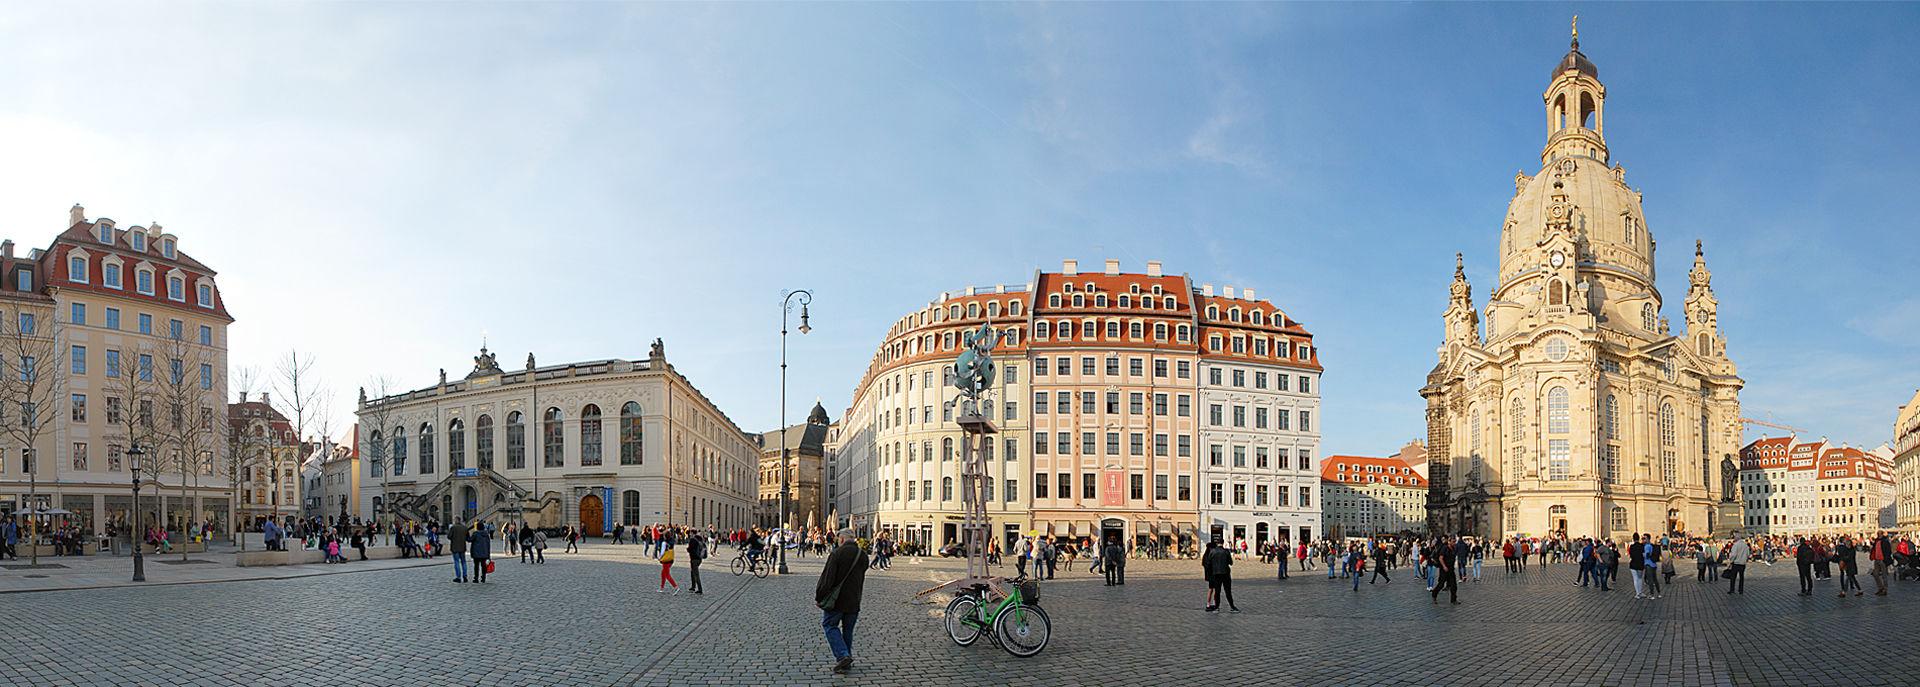 Neumarkt Dresden  © RGVG - Andy Linz